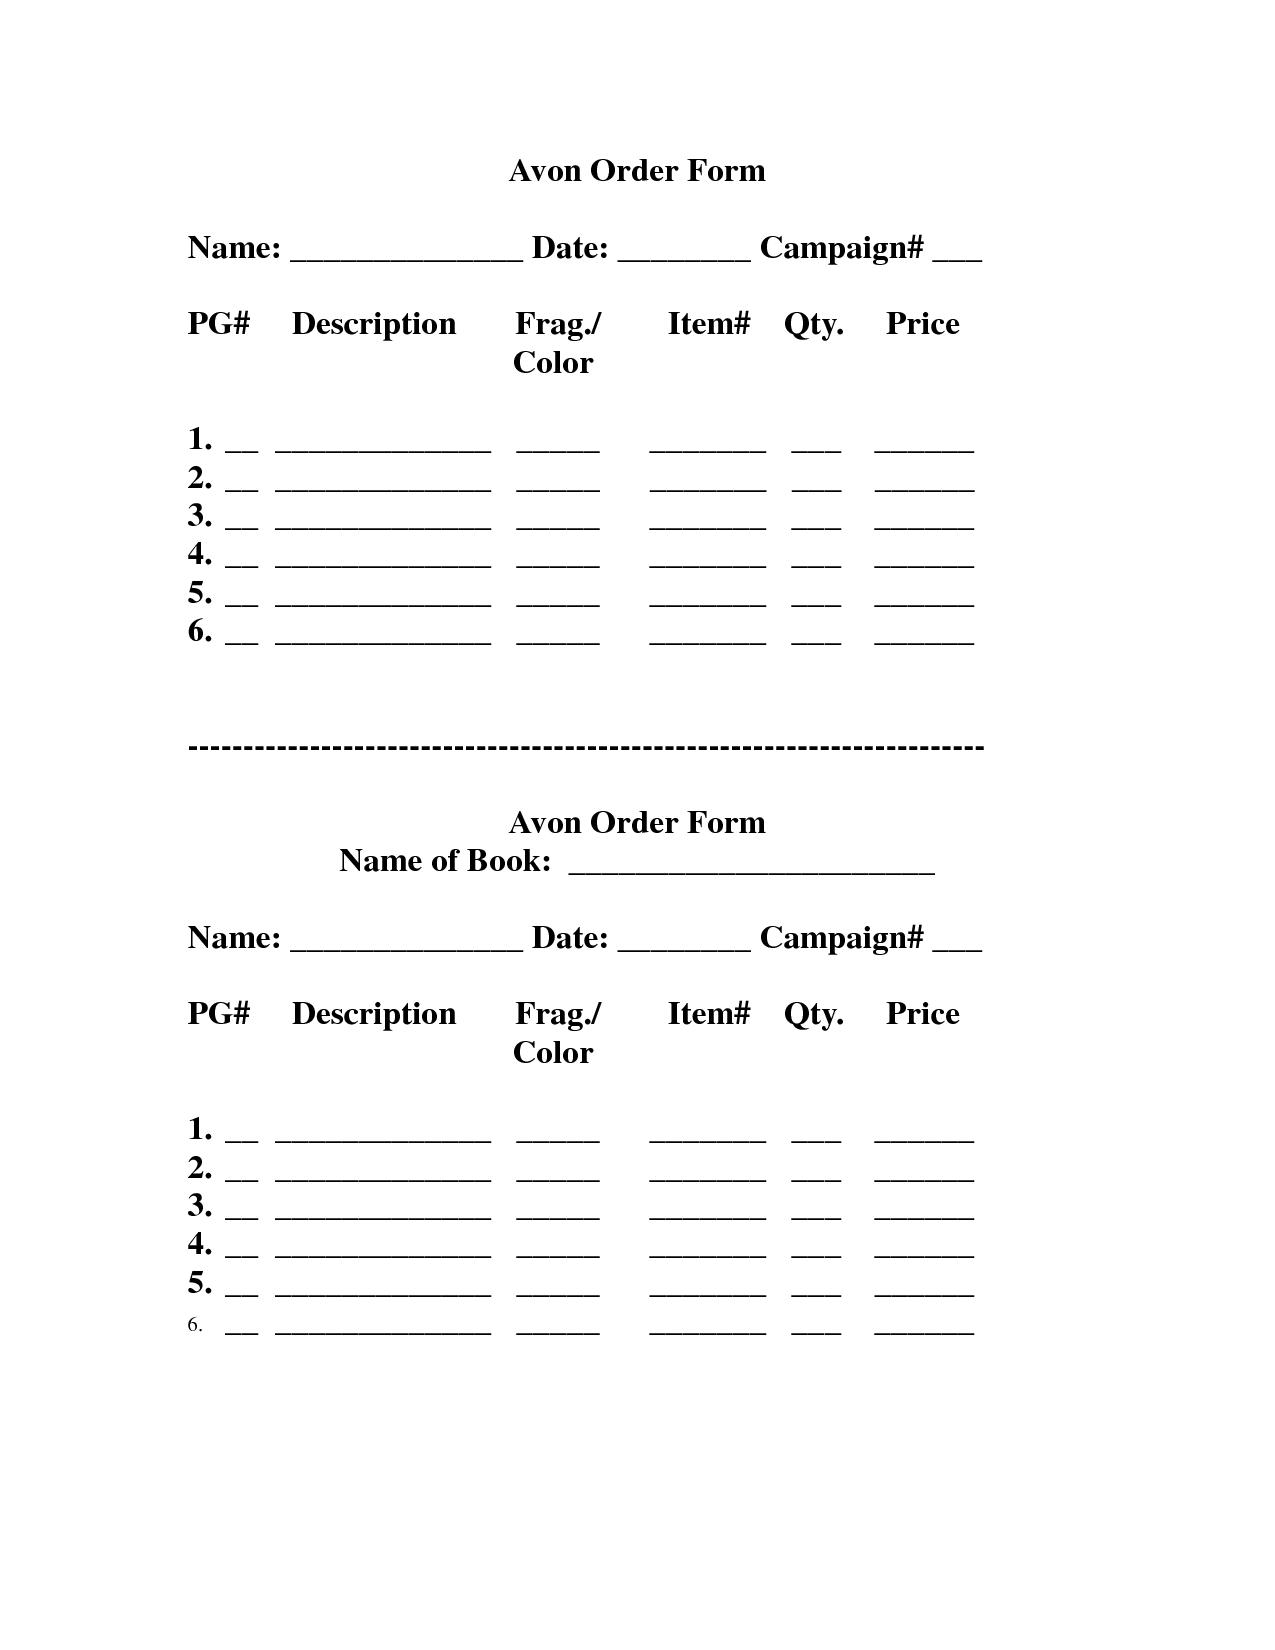 avon invoice template residers info avon receipt template 1000 images about avon order invoice templates